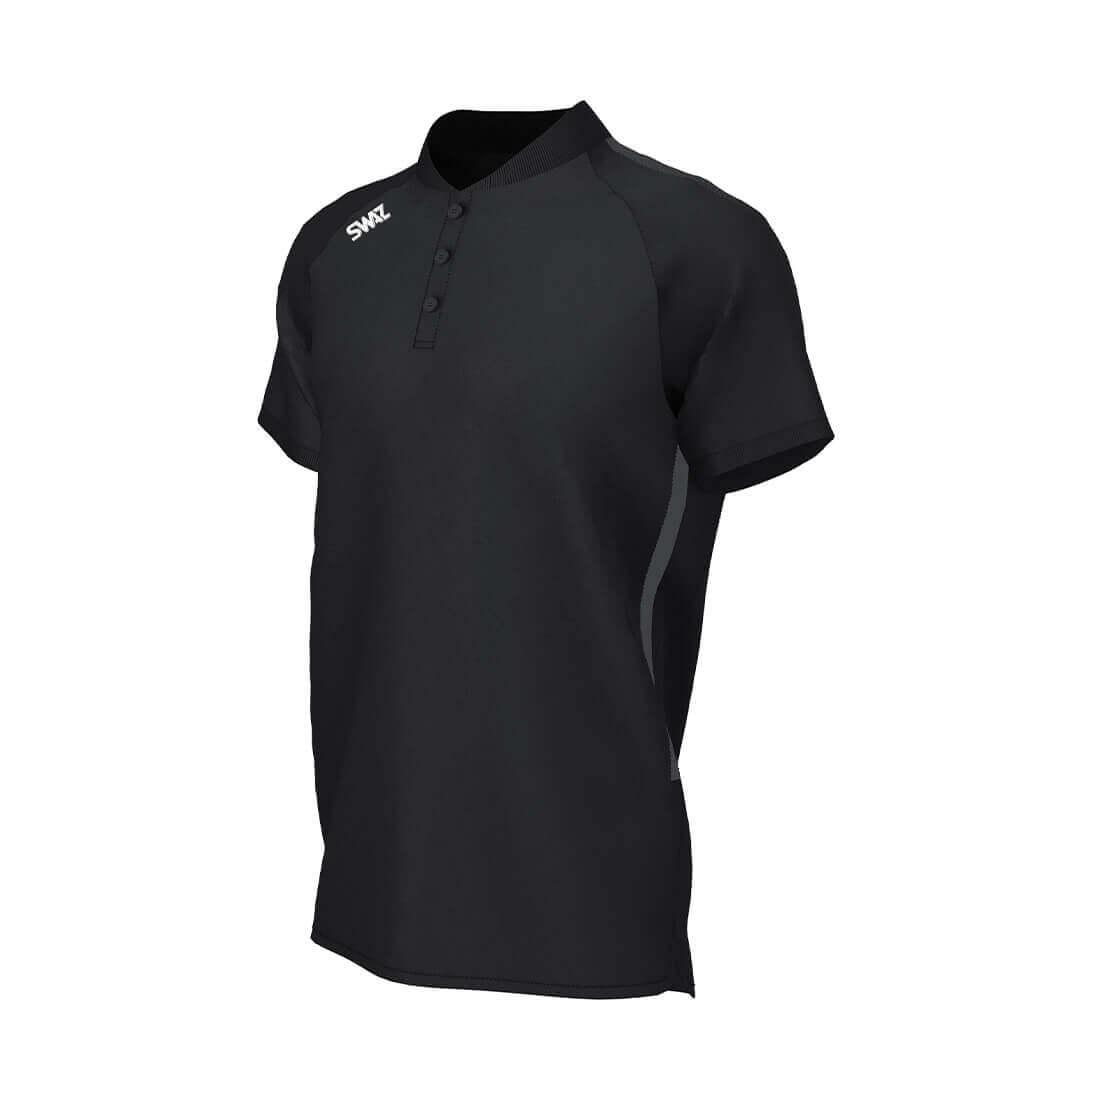 Elite Football Polo Shirts | Football Training Kit and Teamwear – SWAZ